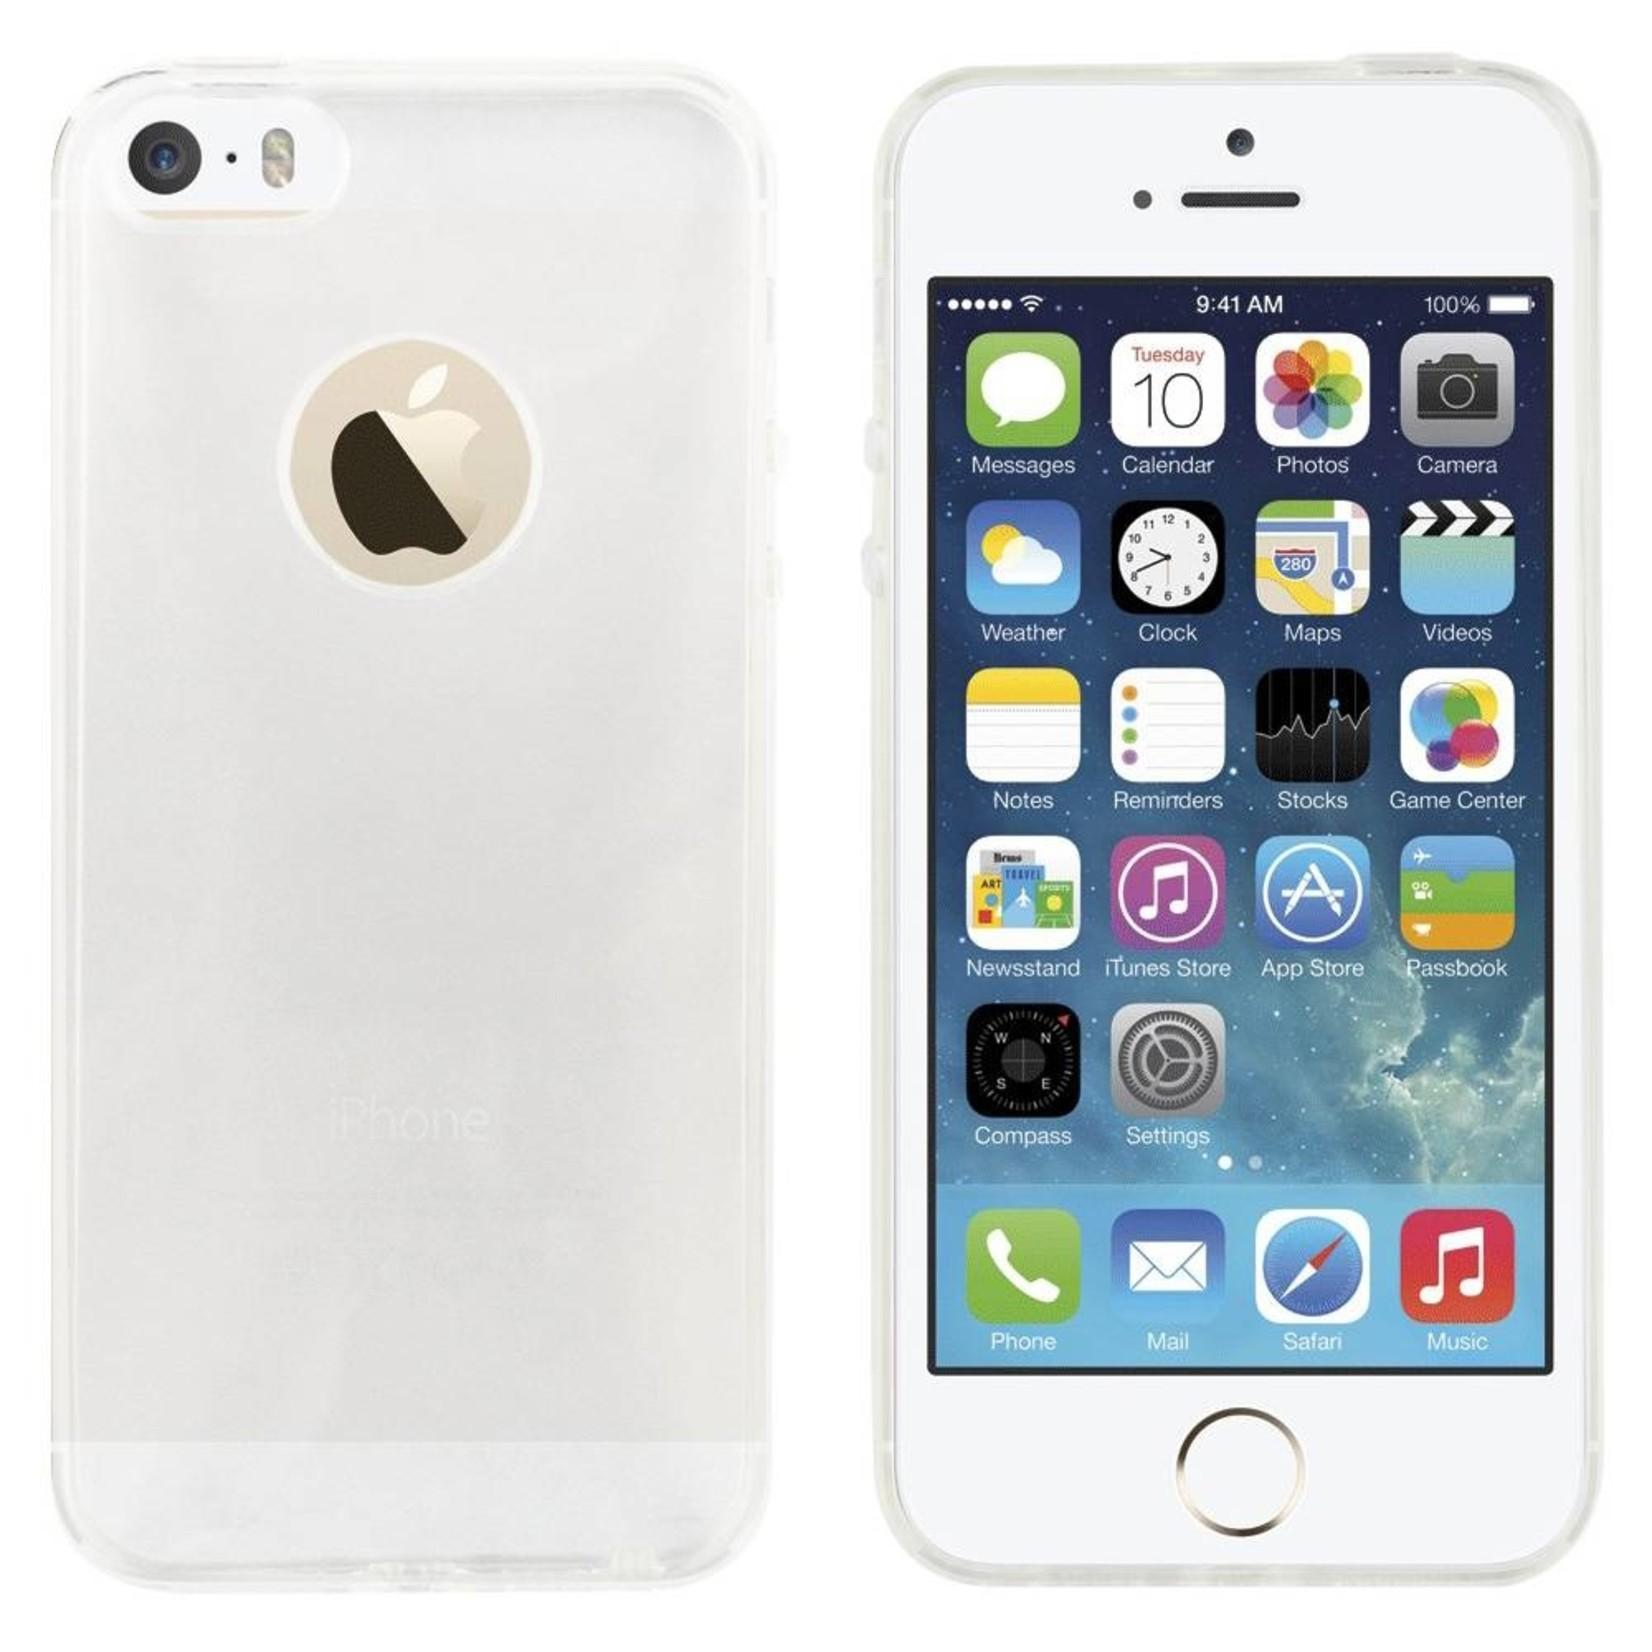 Colorfone Hoesje CoolSkin3T voor Apple iPhone 5/5S/SE Tr. Wit